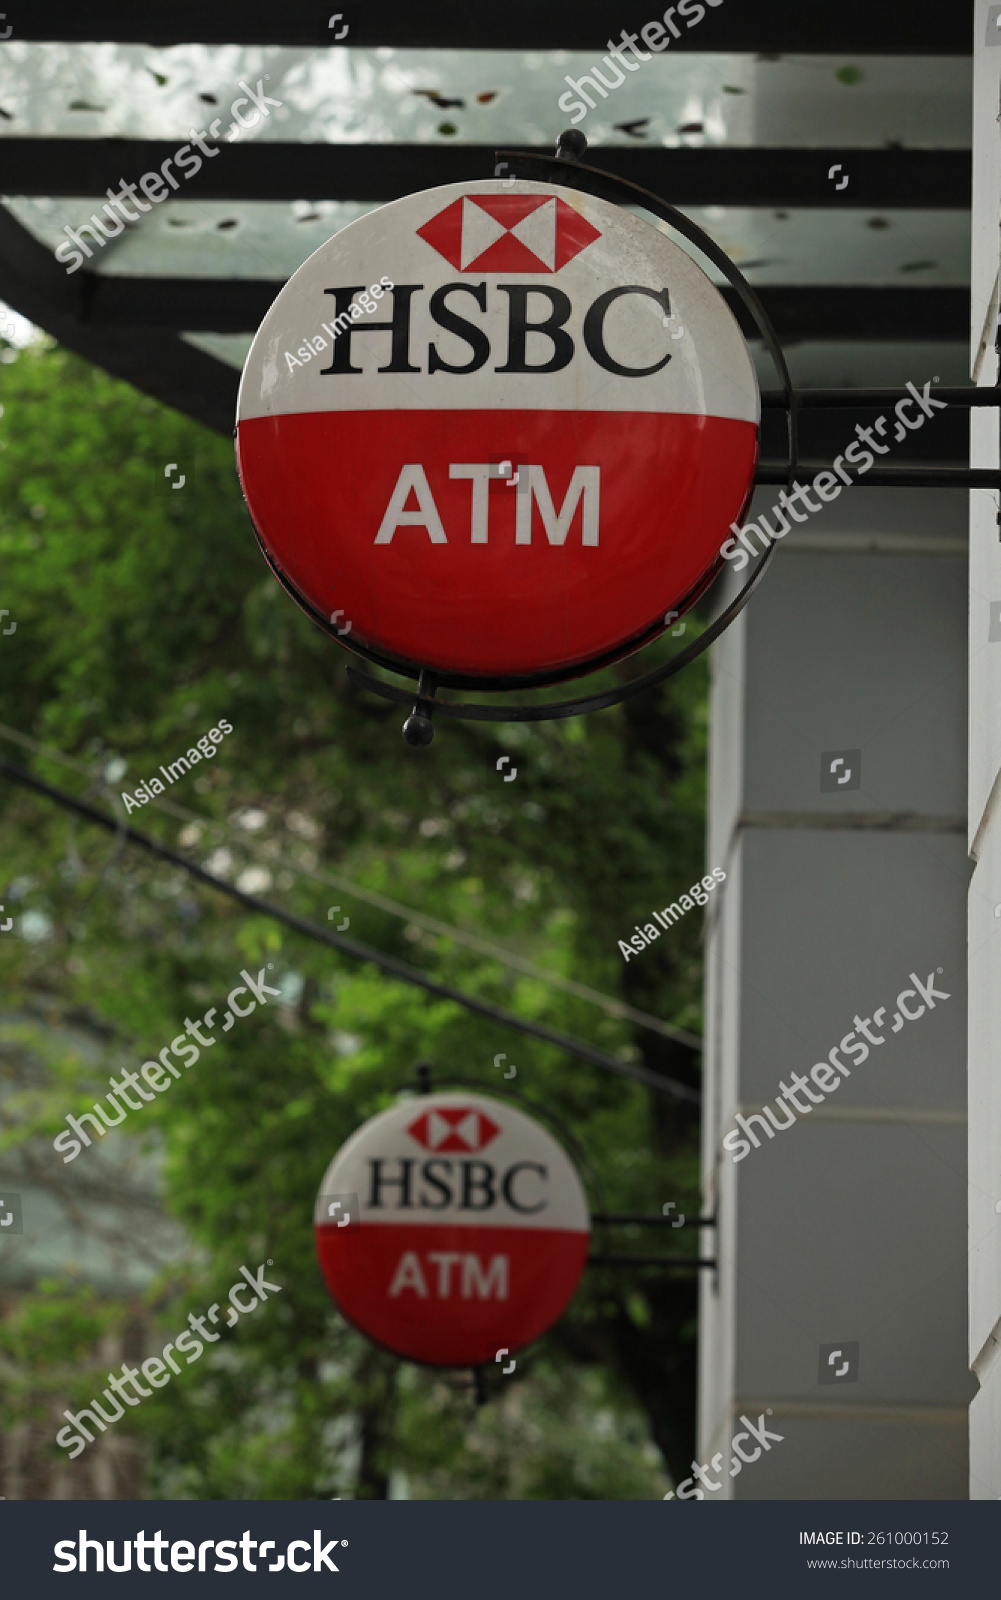 Hanoi Vietnam Mar 15 2015 Hsbc Stock Photo (Edit Now) 261000152